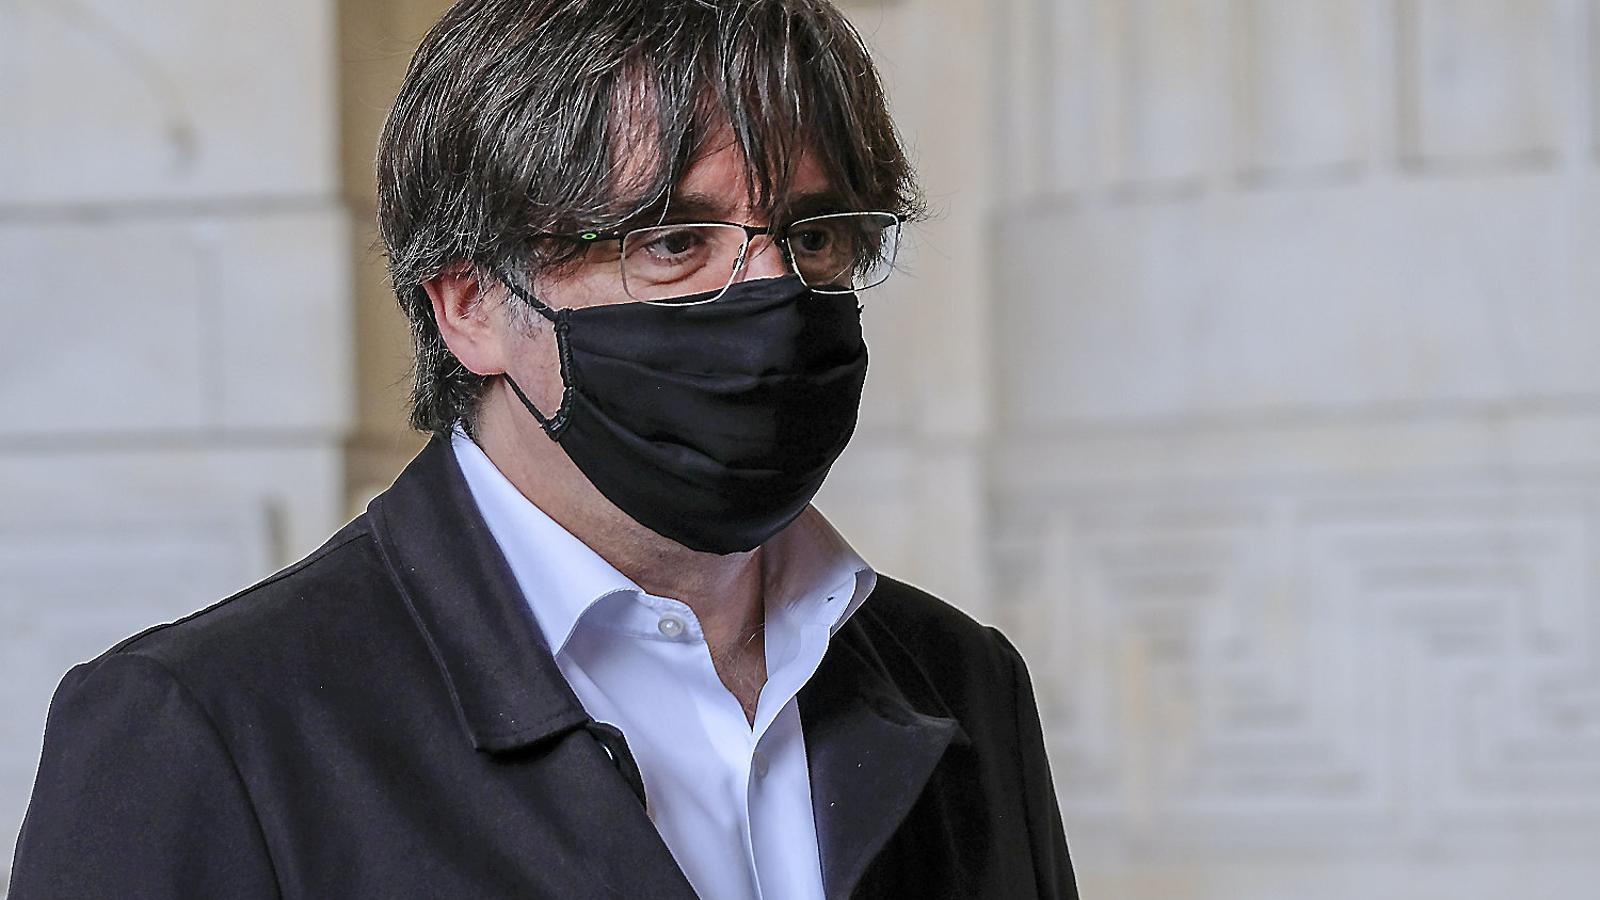 L'expresident Carles Puigdemont en una imatge recent.